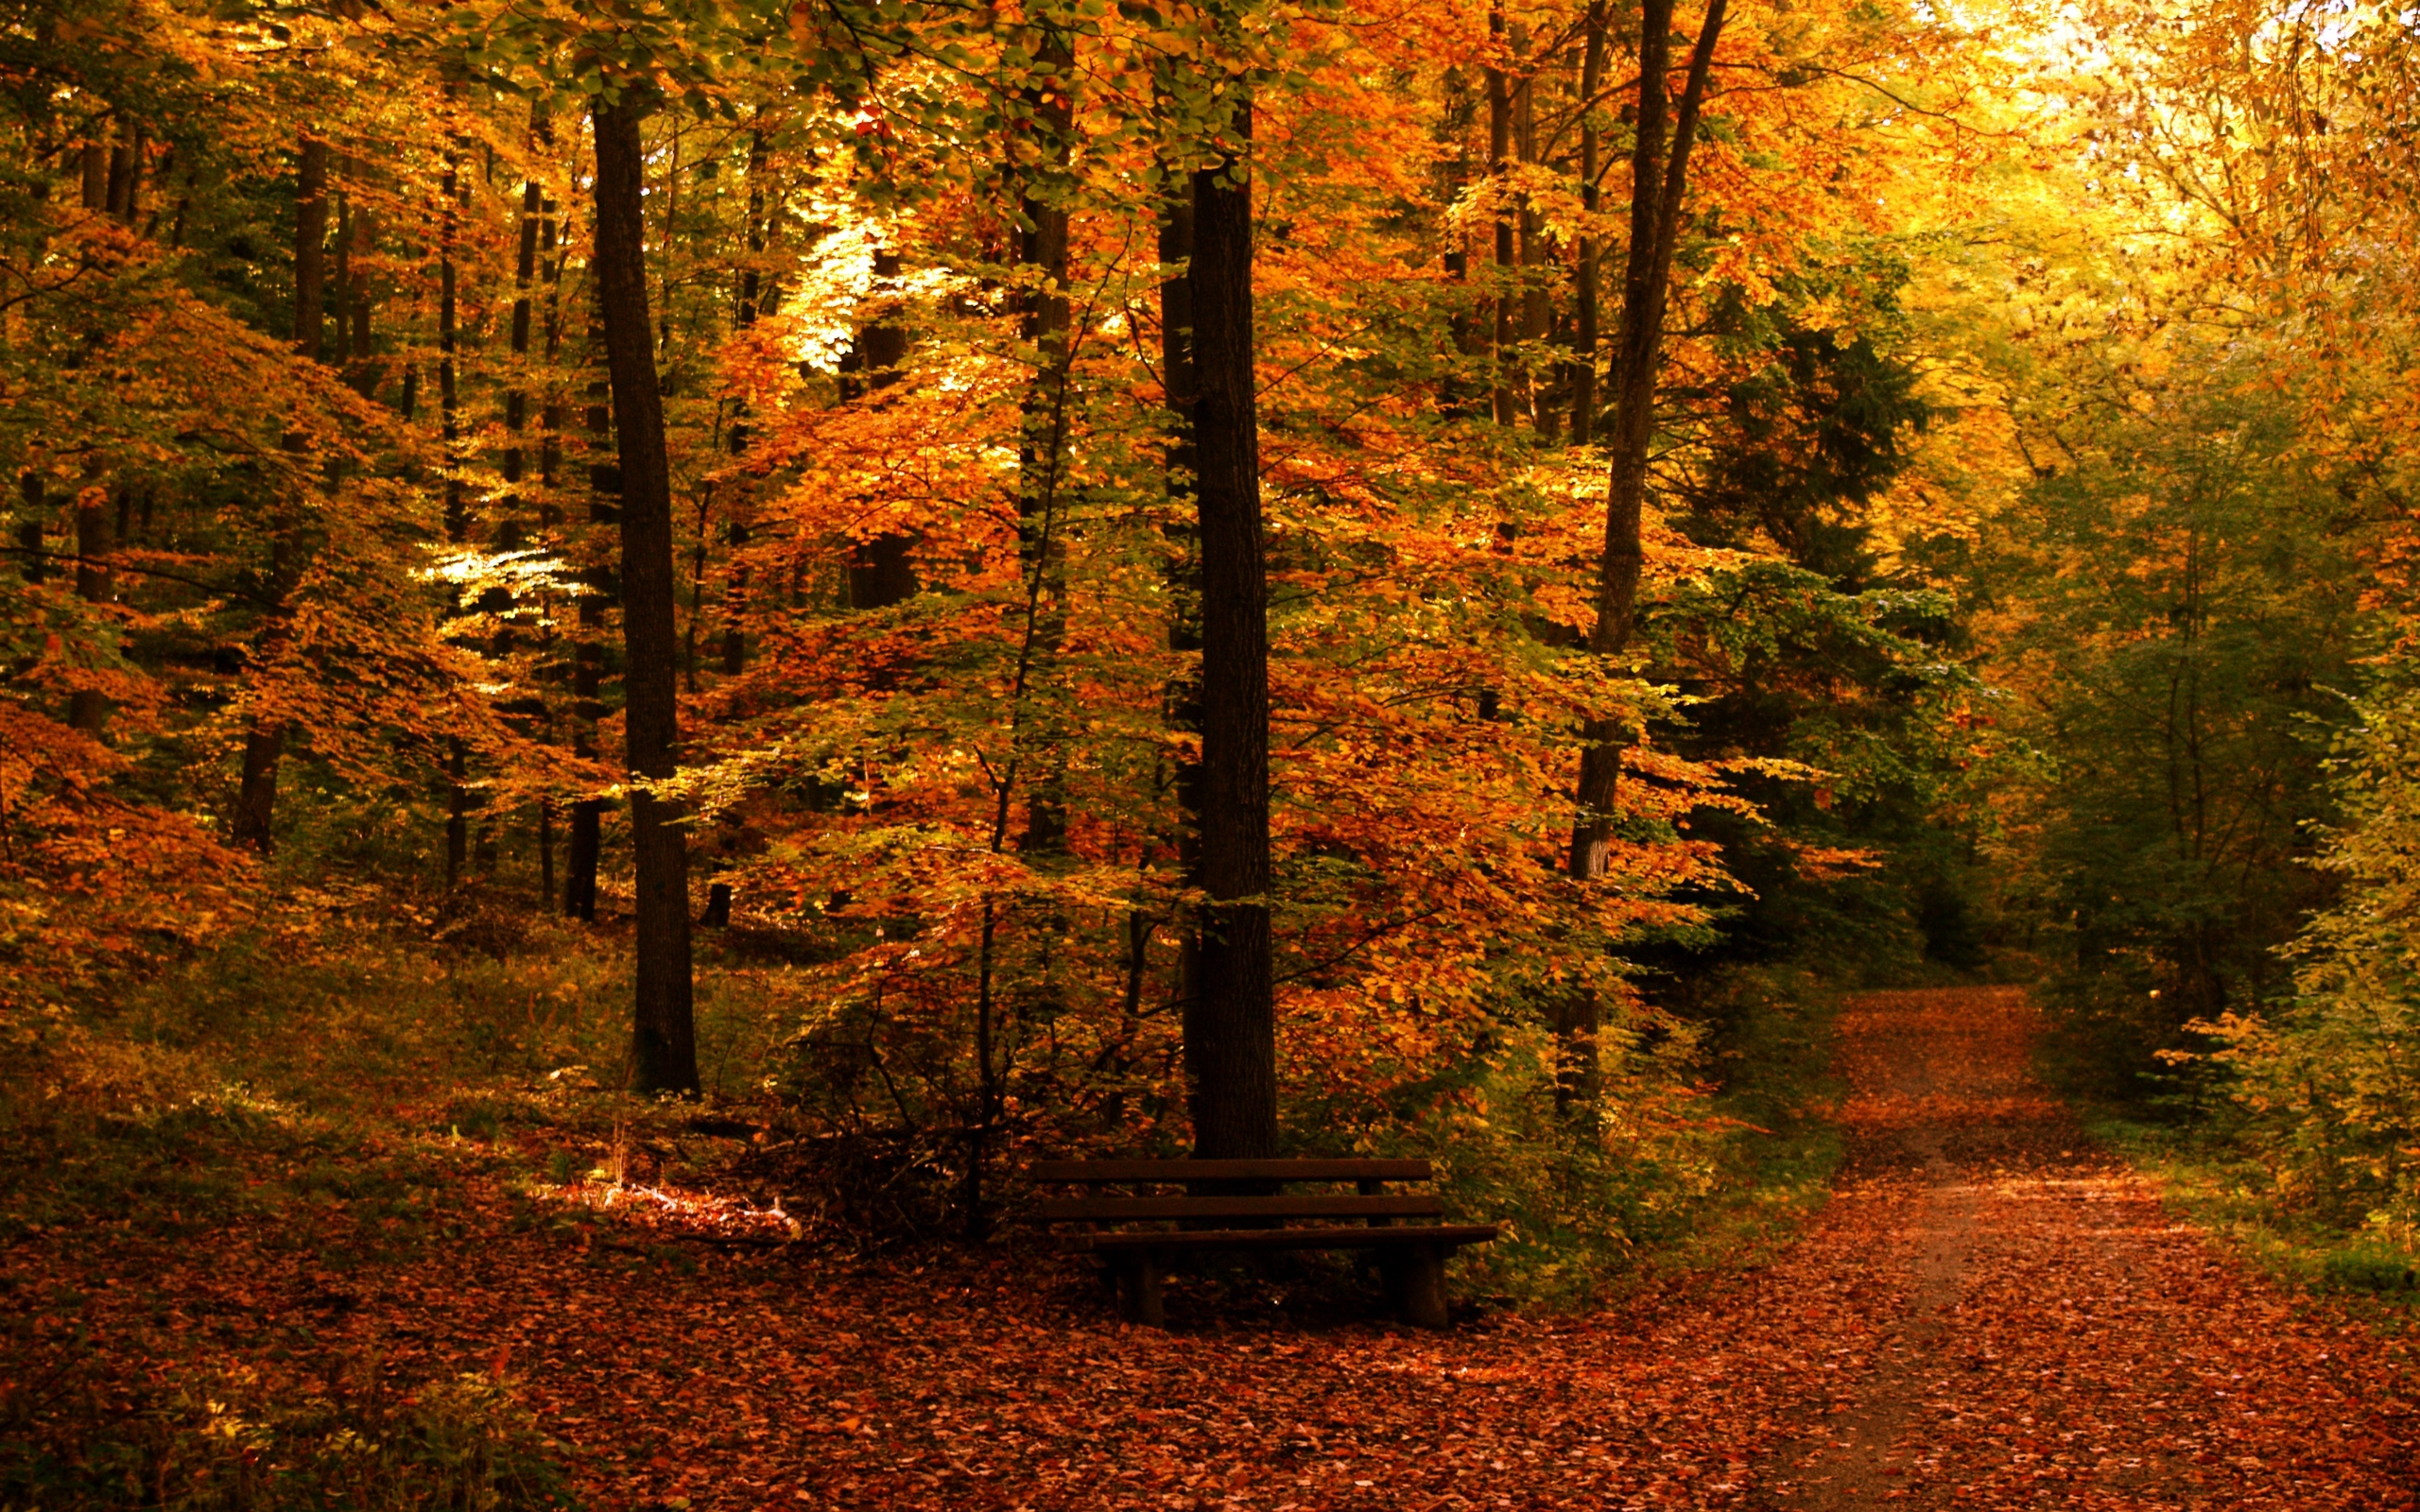 URL httpmi9comautumn free wallpaper autumn path 93126html 2560x1600